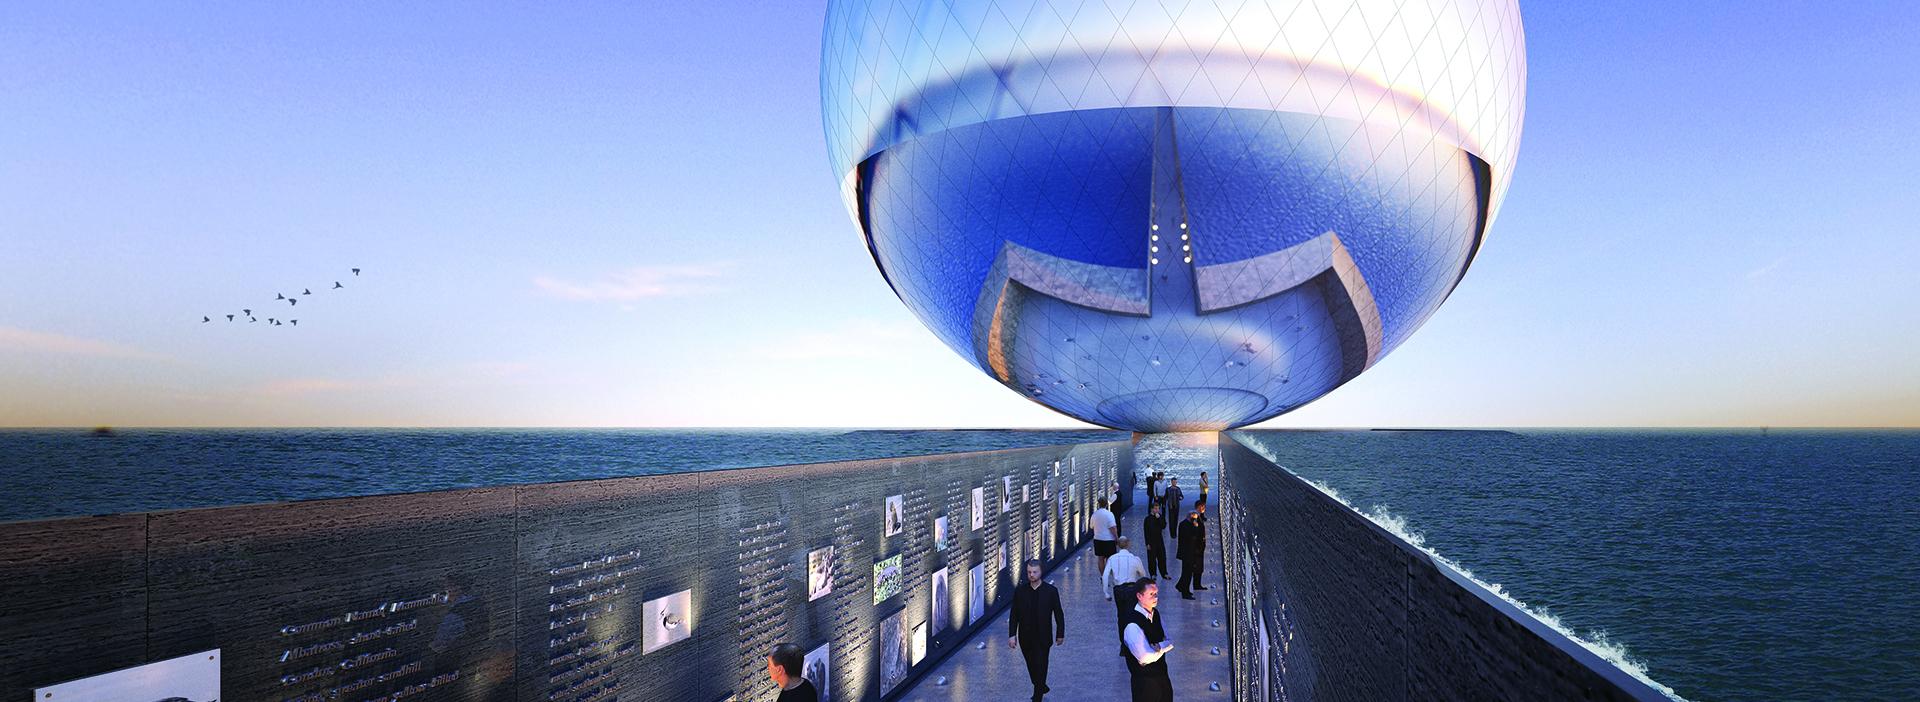 clean energy careers in desalination